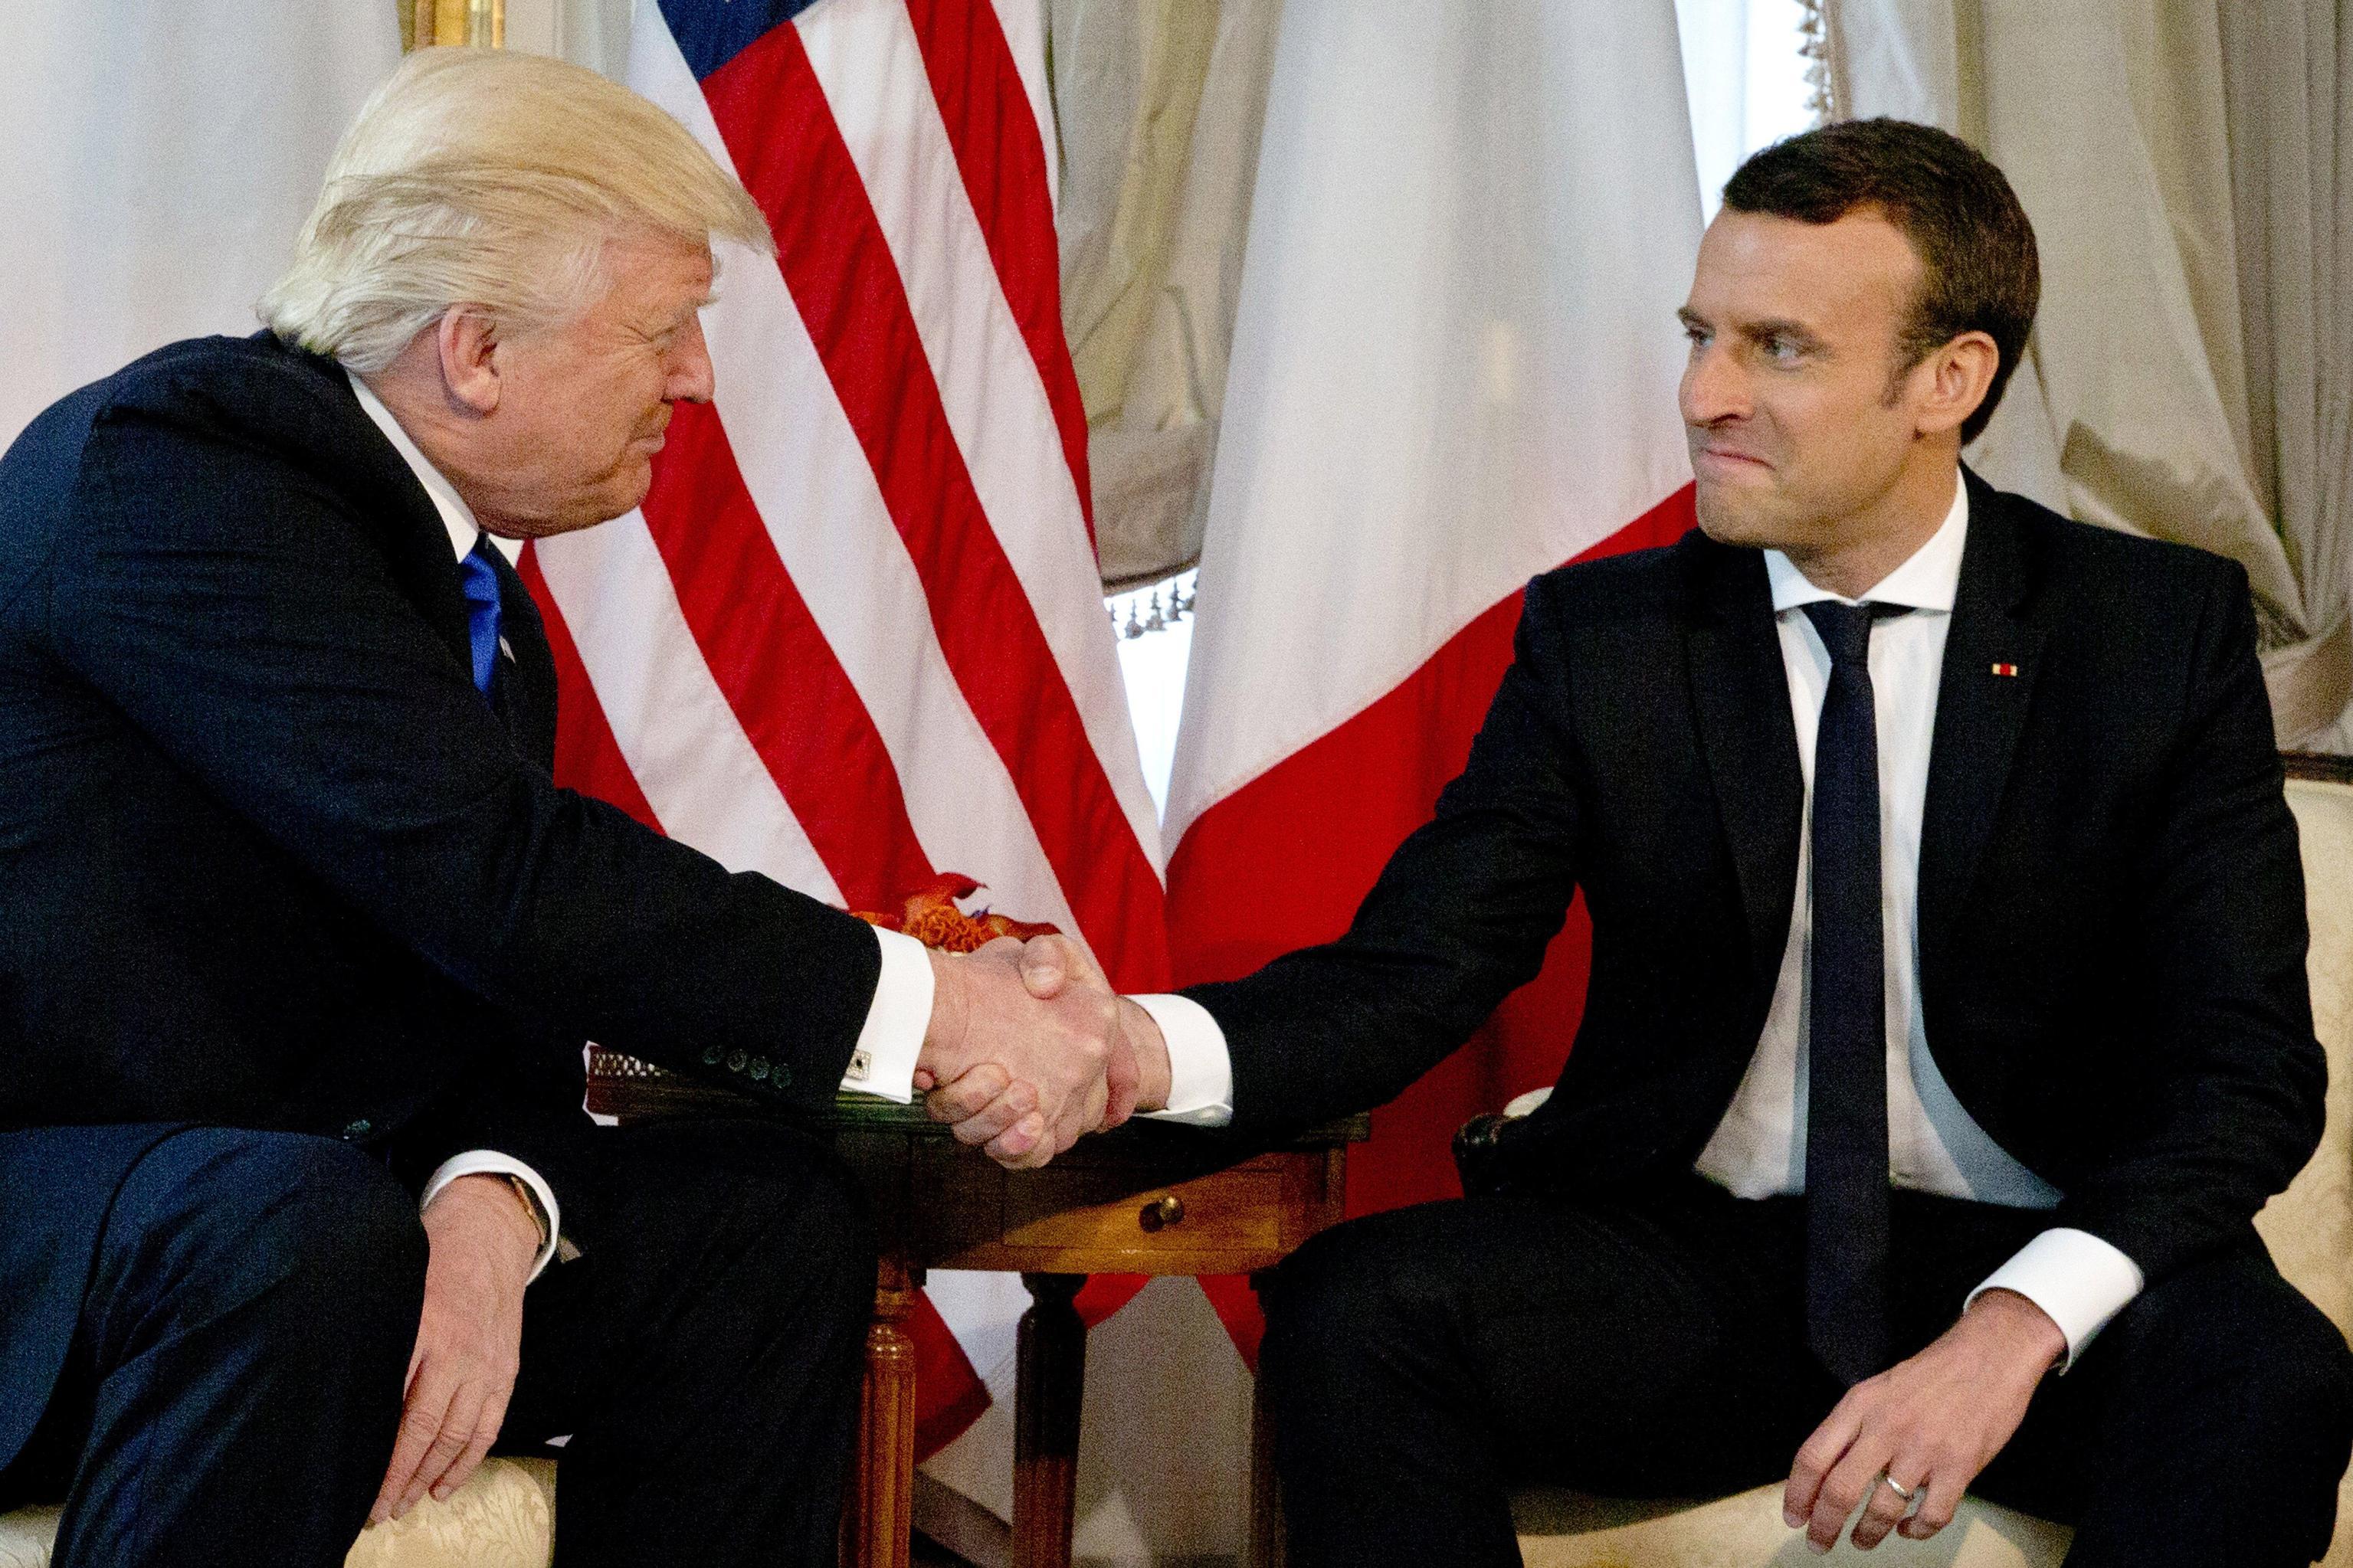 US President Trump meets French President Macron